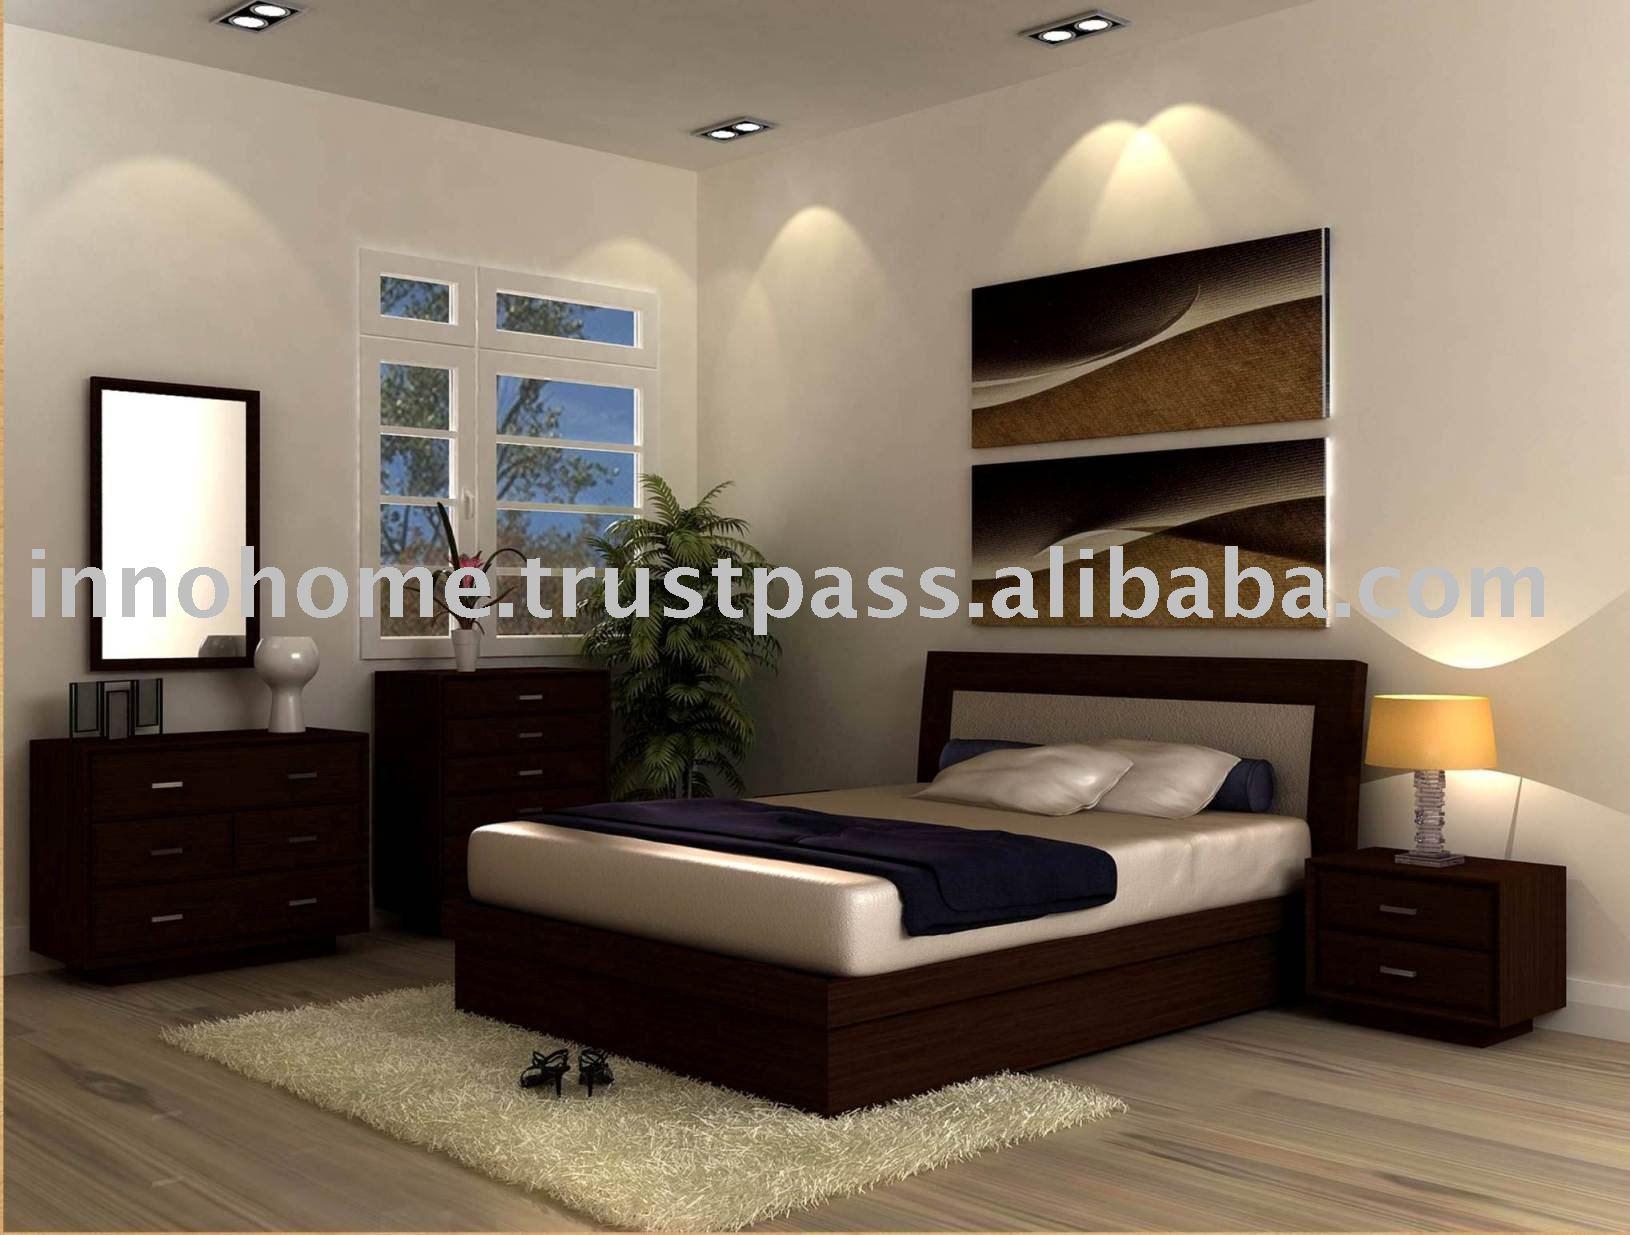 mickey mouse bedroom set furniture girls bed wardrobe desk ideas